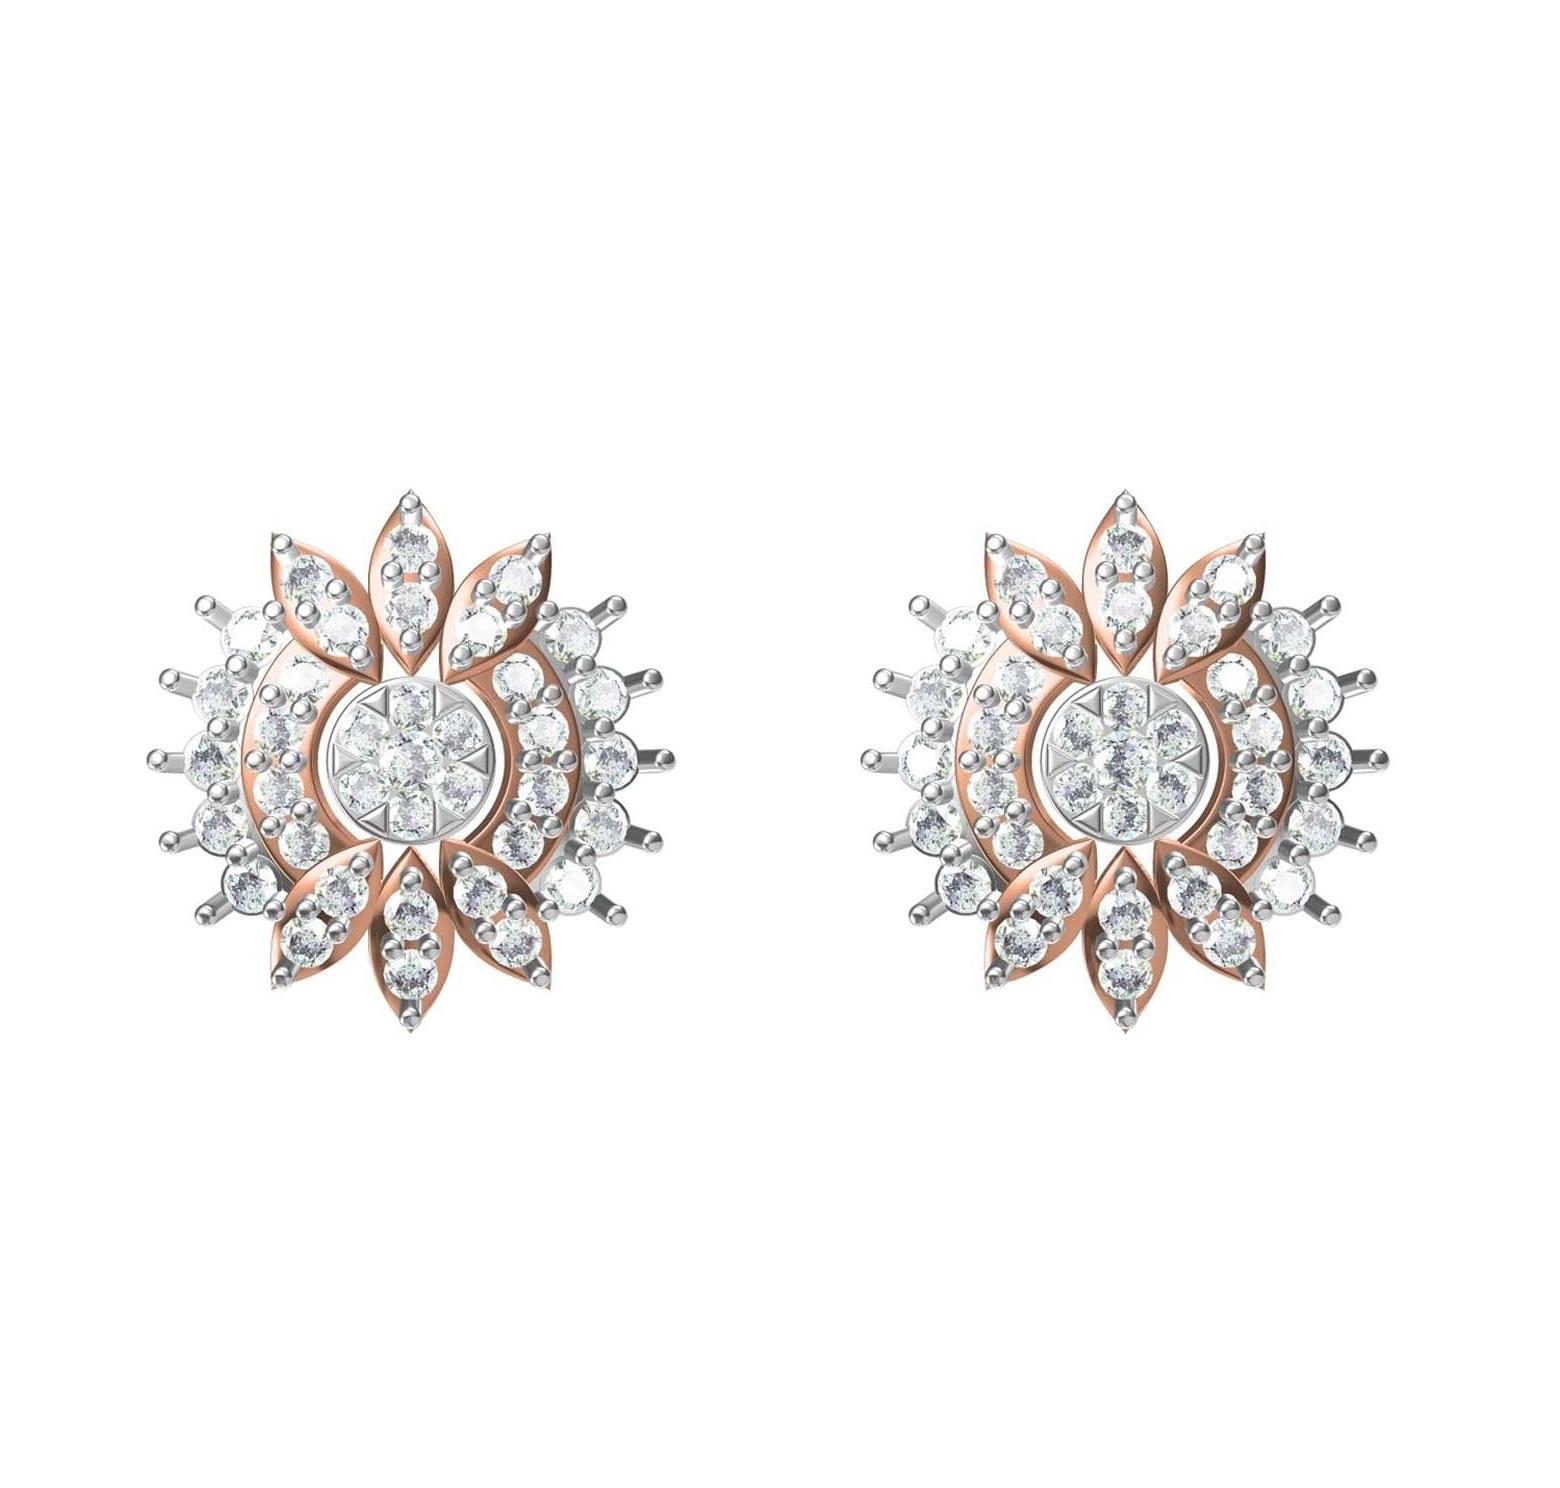 Diamond Earring TCW 1.062 14K gold 4.2 gm